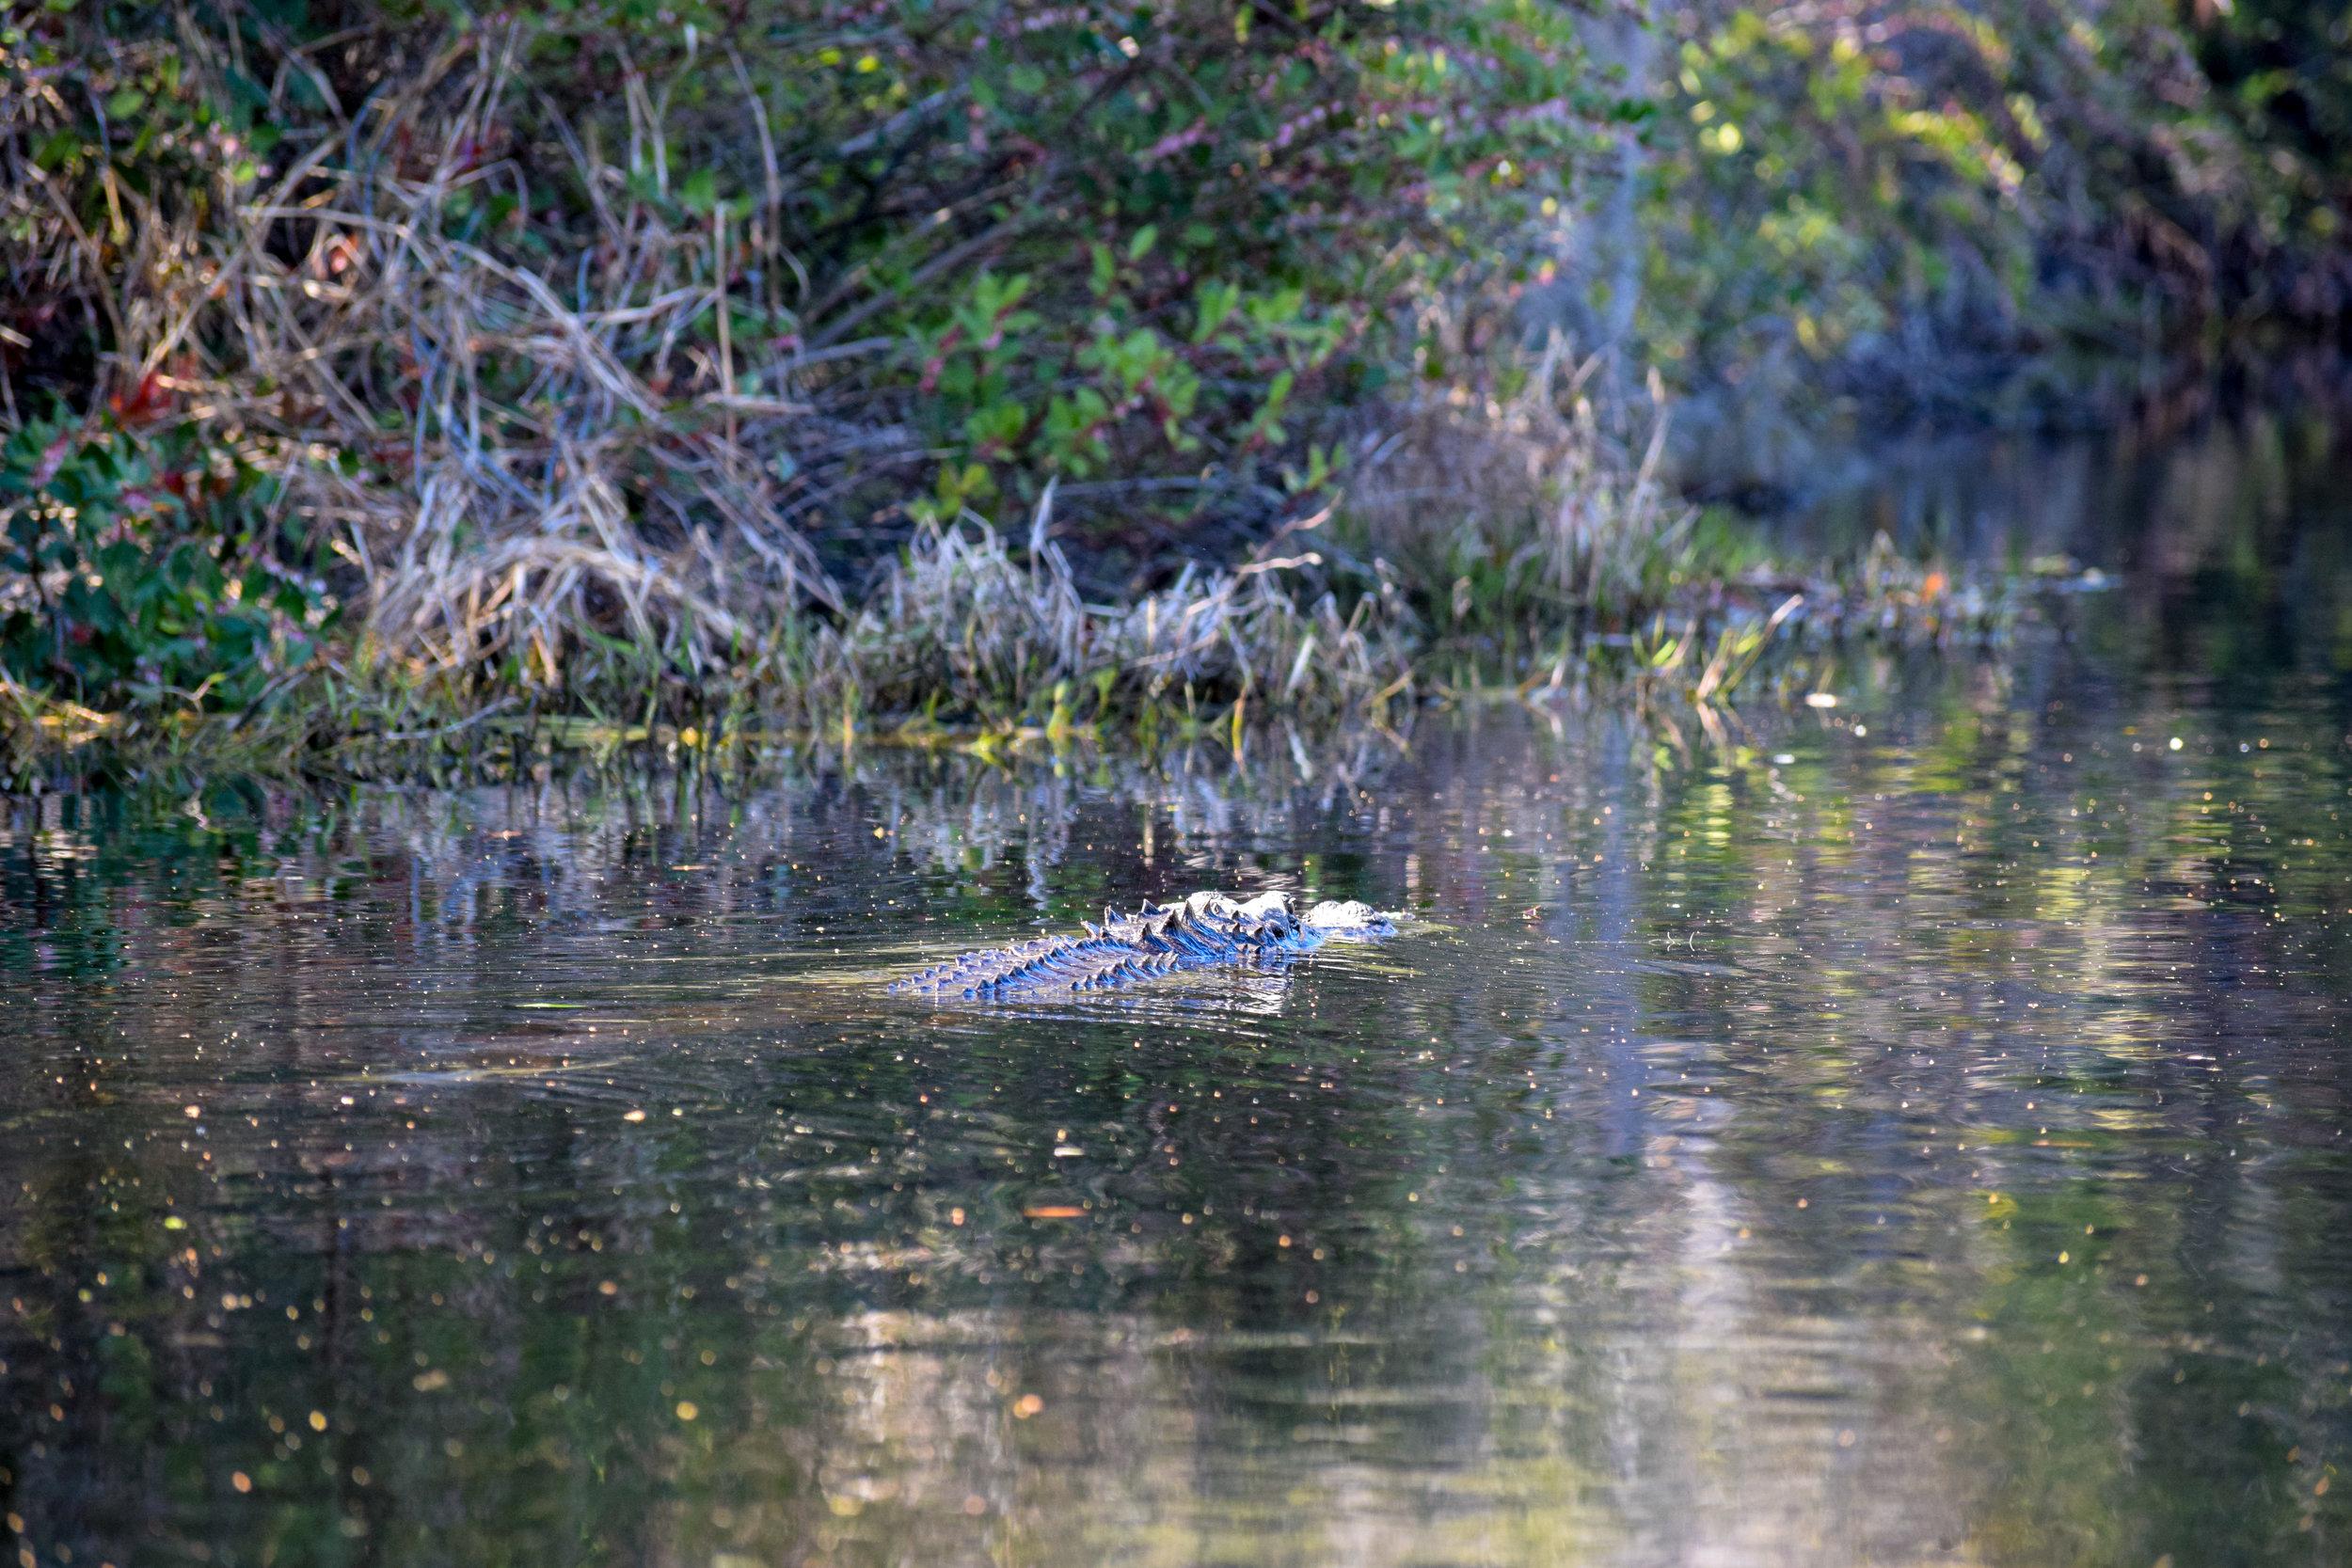 An alligator swims away in Okefenokee Swamp, March 2018  Photo credit: Nicole M. Baran